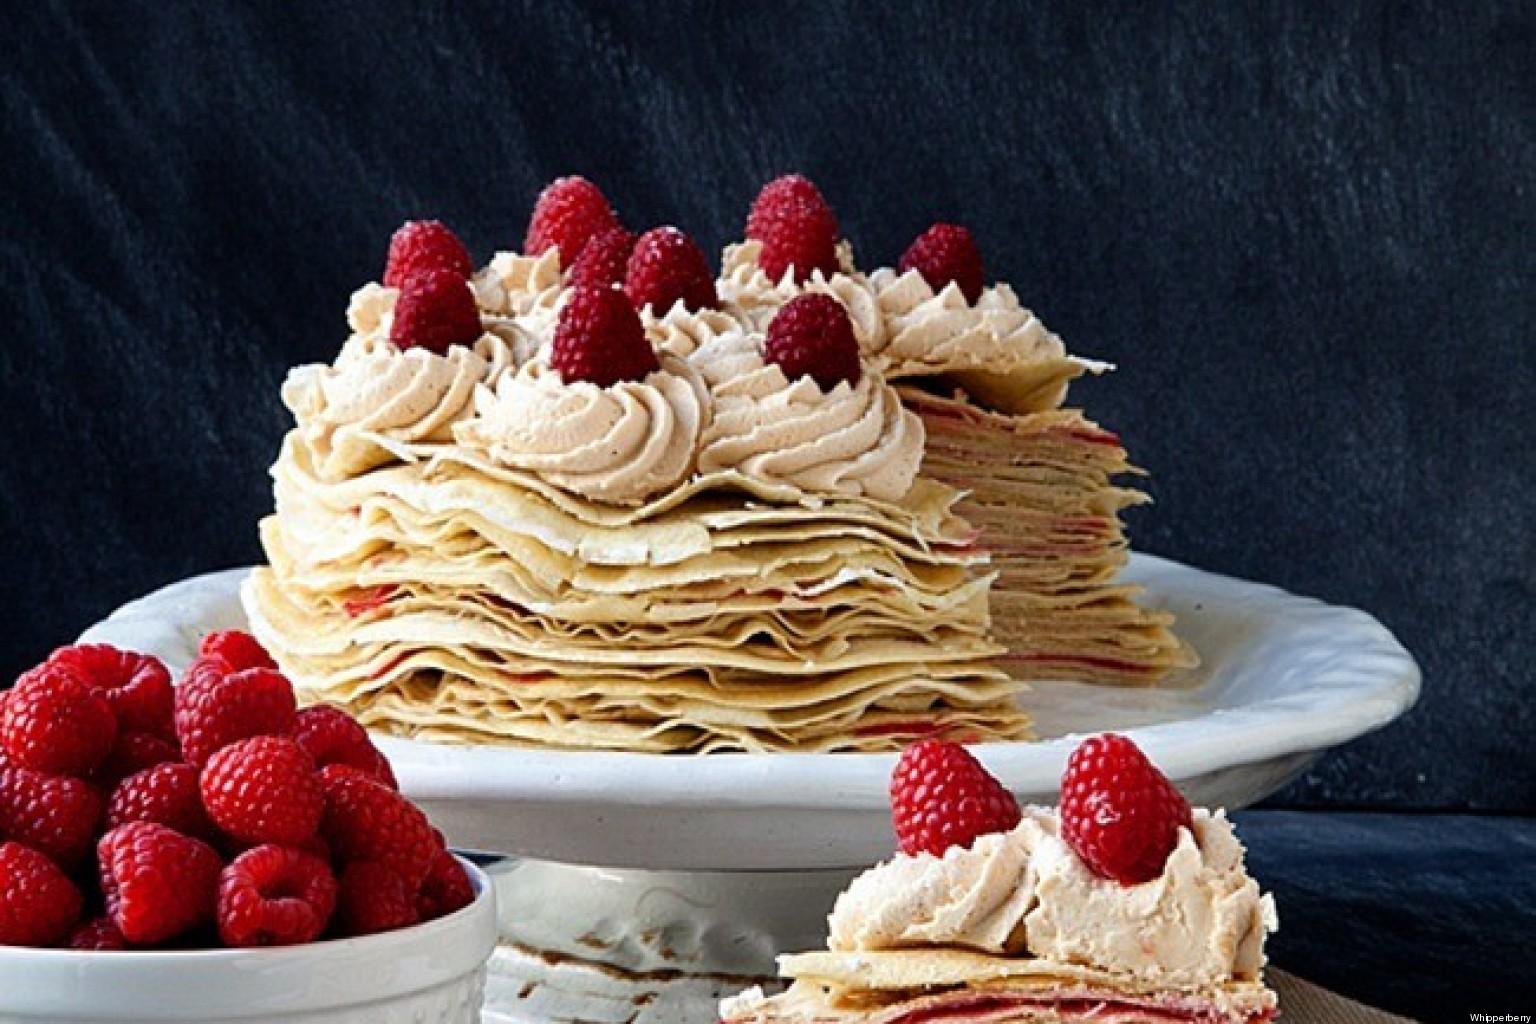 Baked Chocolate Mousse Cake Recipe